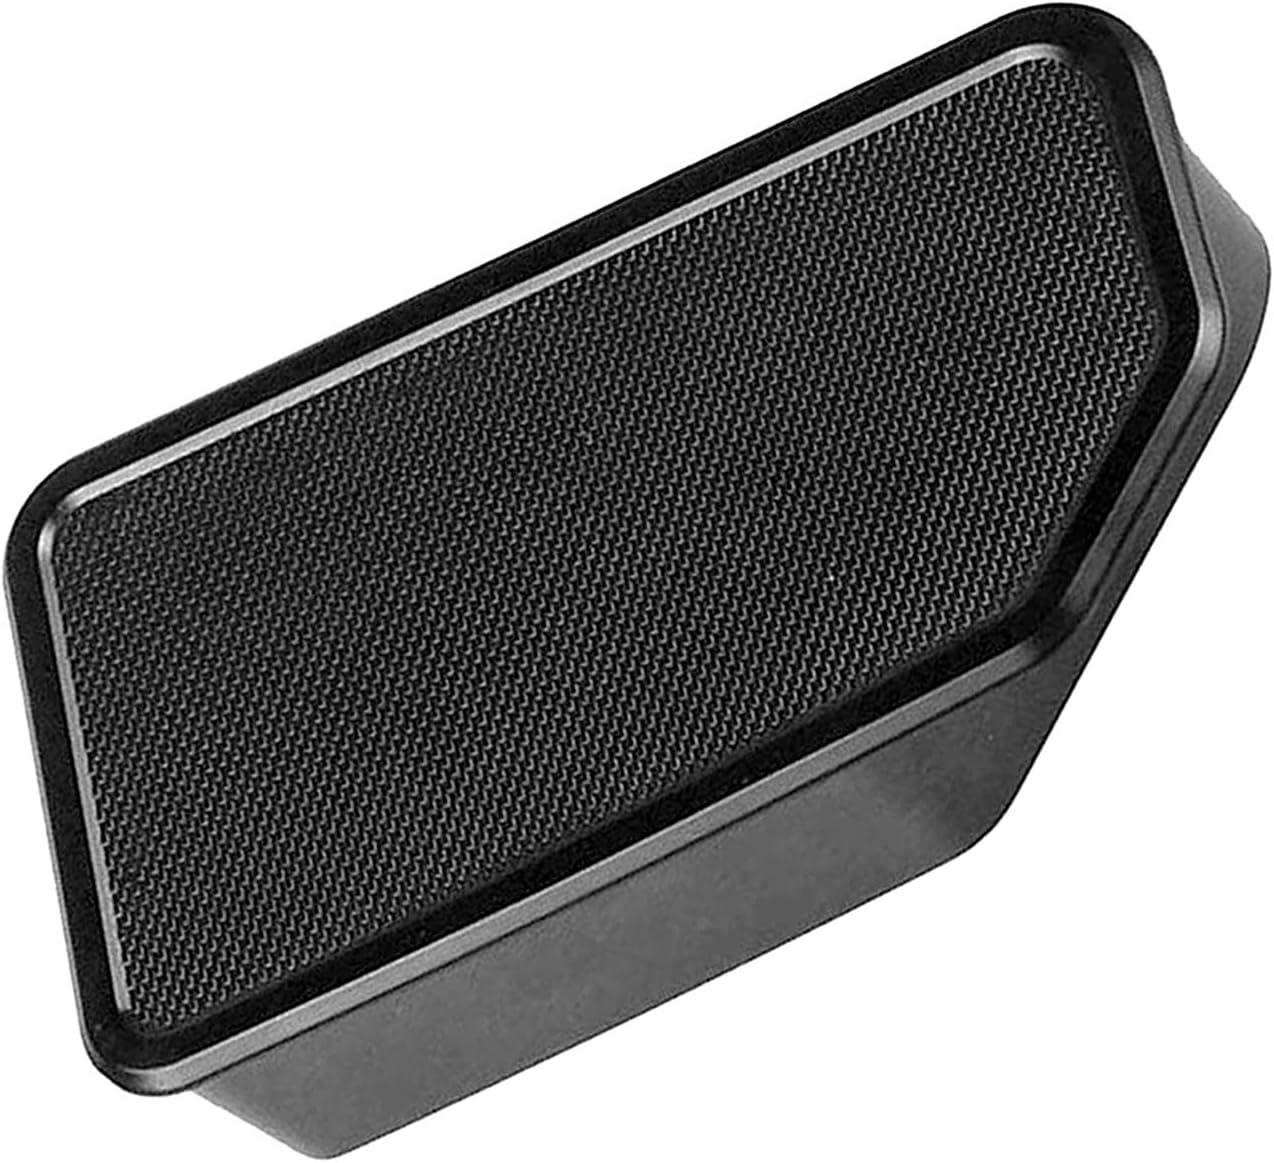 ACauto Truck Luggage Bed Rail Post Stake Pocket Covers Caps Plugs Set of 2 Fits 2019-2020 Silverado GMC Sierra Odd Shaped Holes